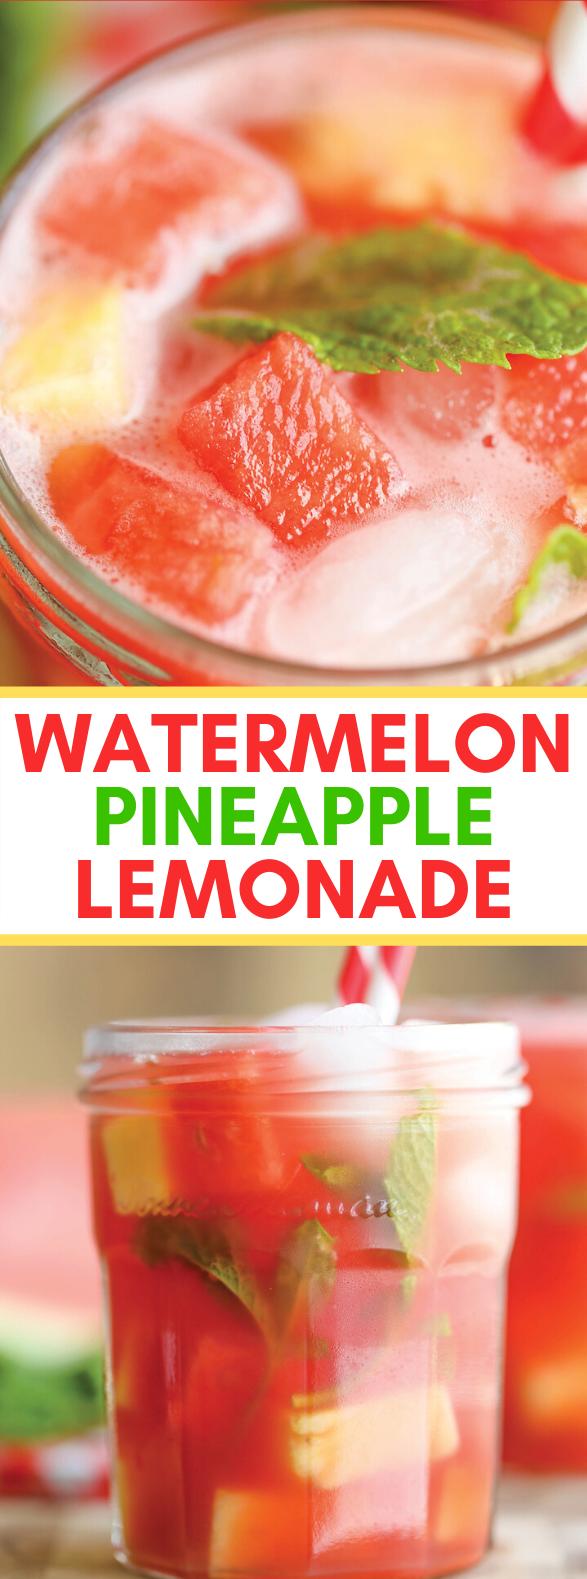 WATERMELON PINEAPPLE LEMONADE #drinks #freshdrink